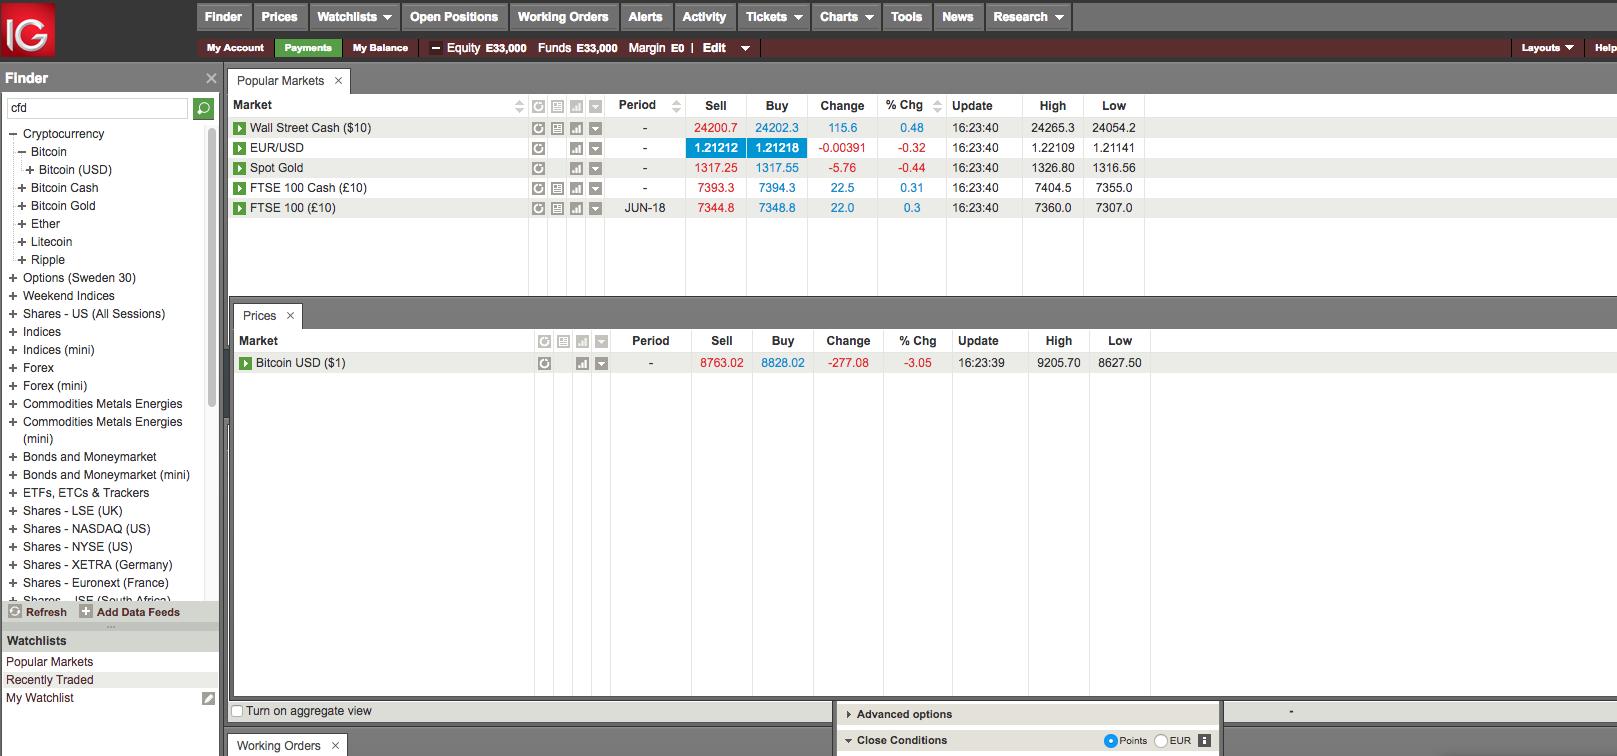 CFD trading tips - IG - Web trading platform